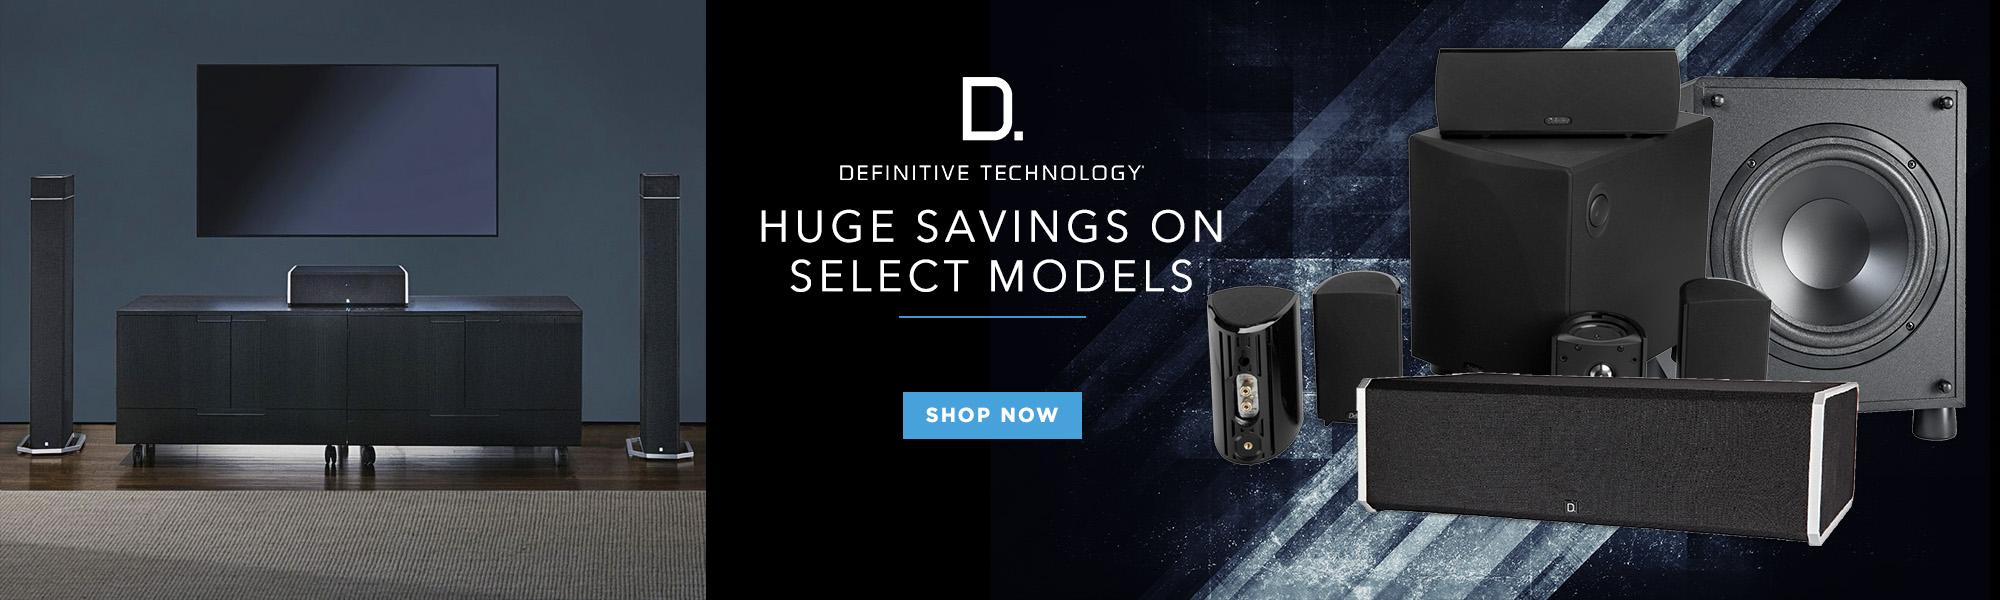 Huge Savings on select models